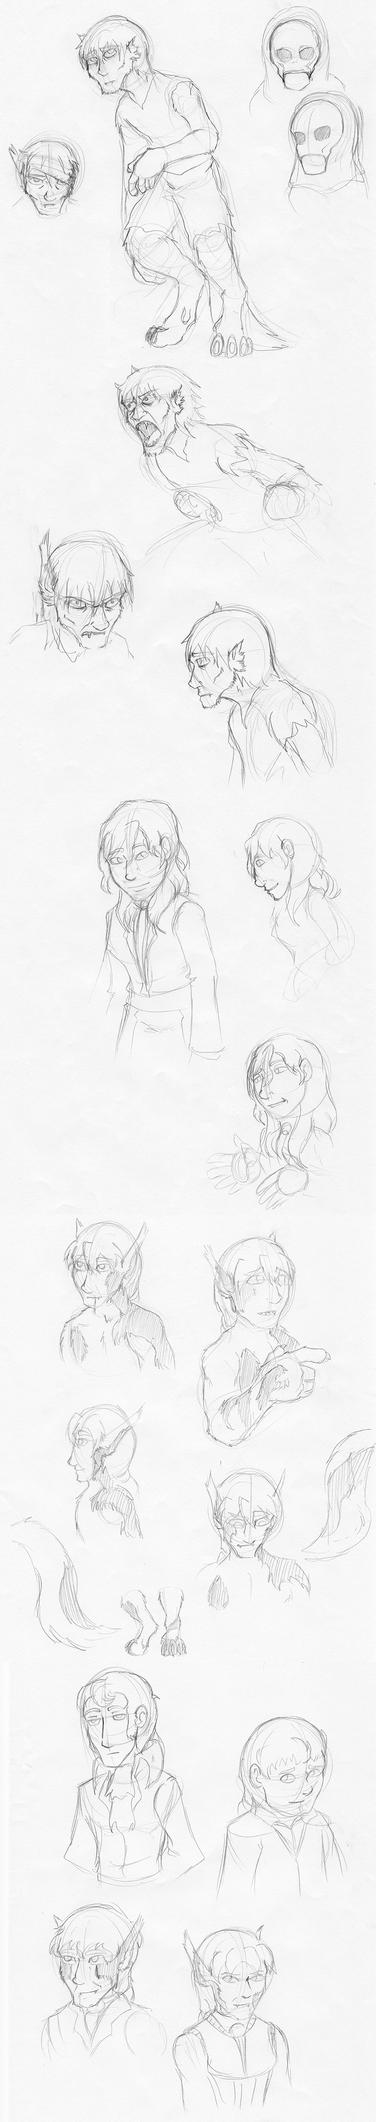 TM2 Sketchdump 4 by dragonsong12